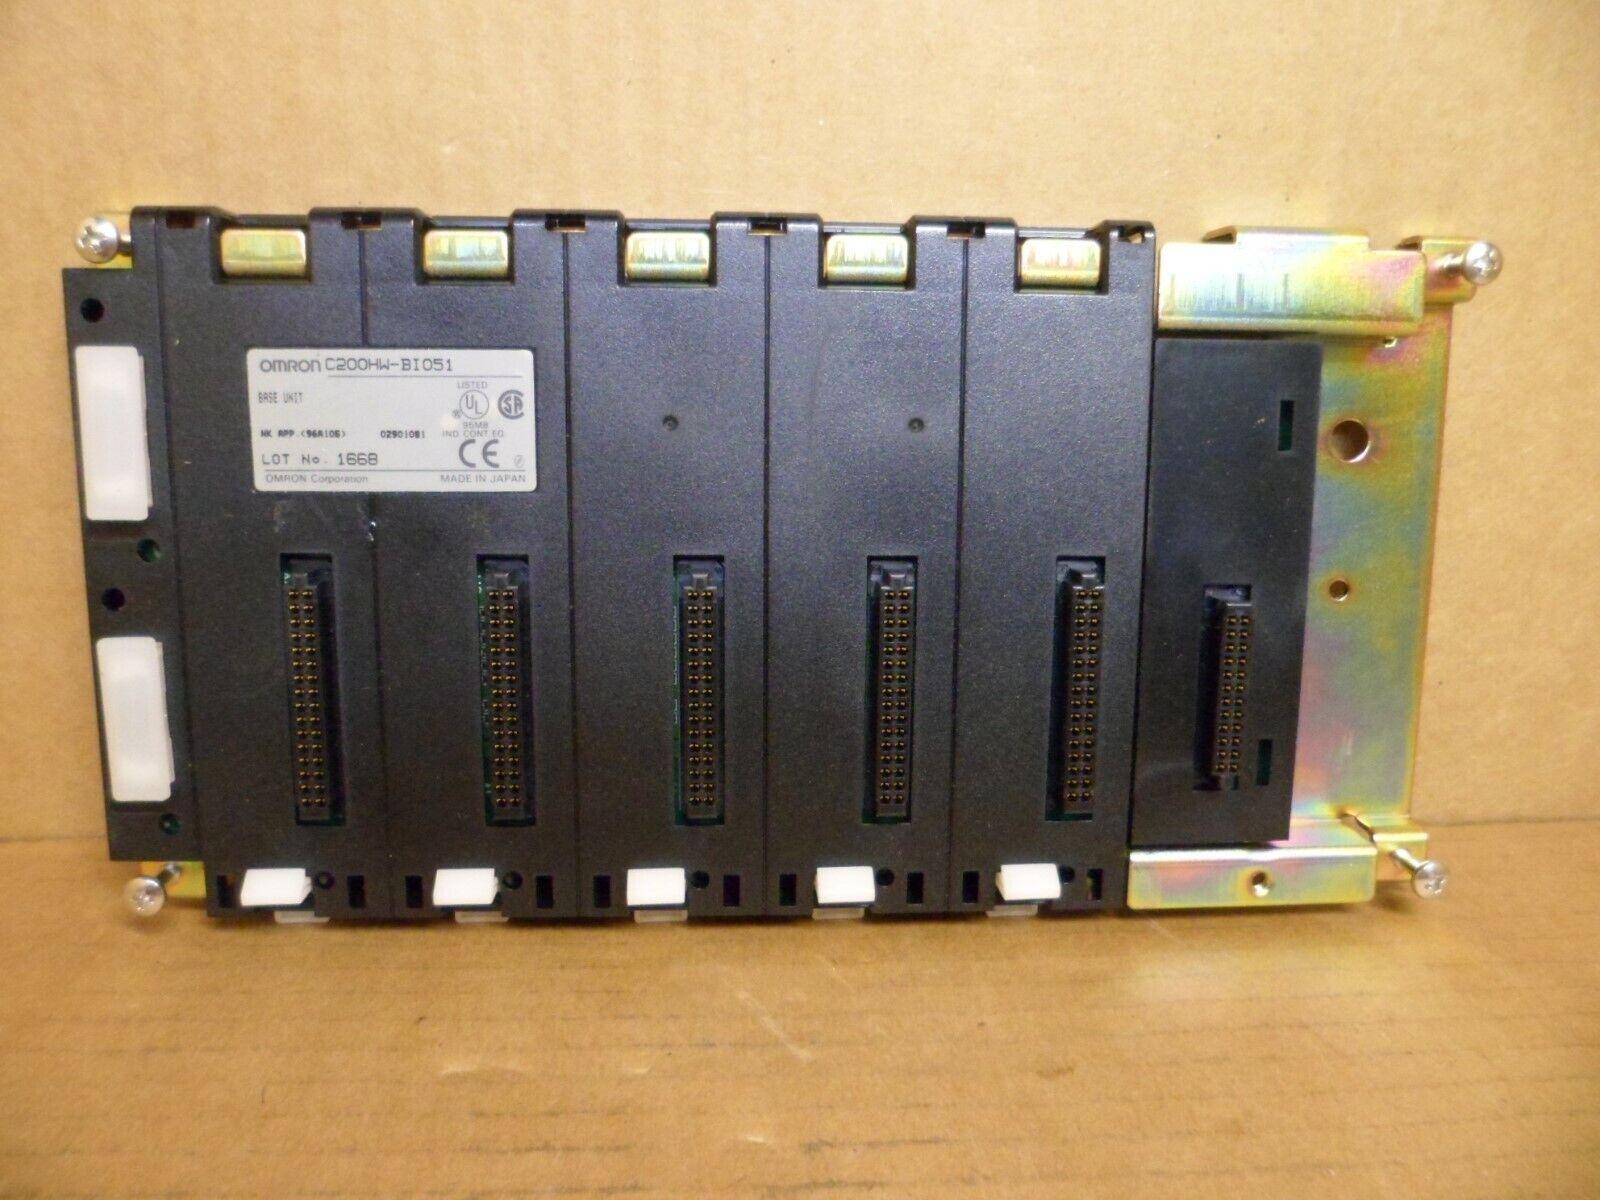 Control Panels & Keypads